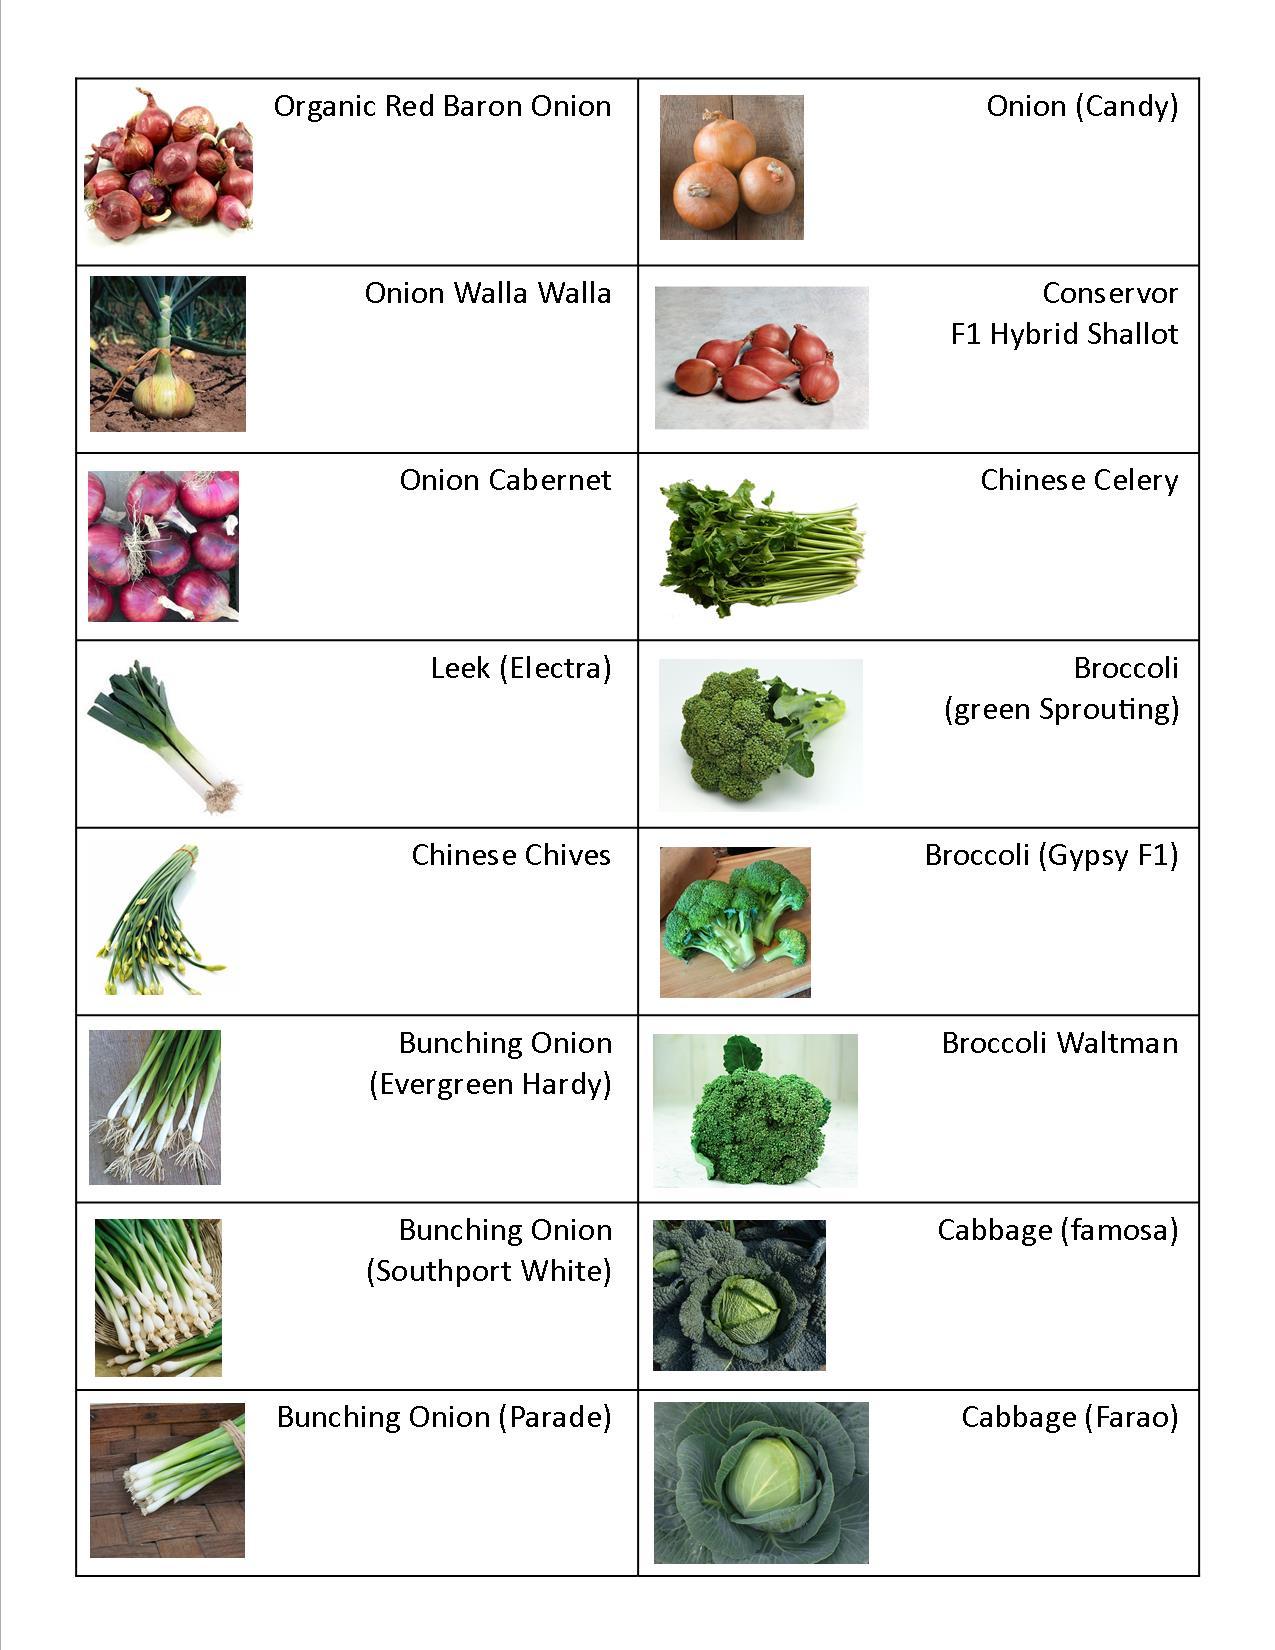 Onions, Broccoli, Celery